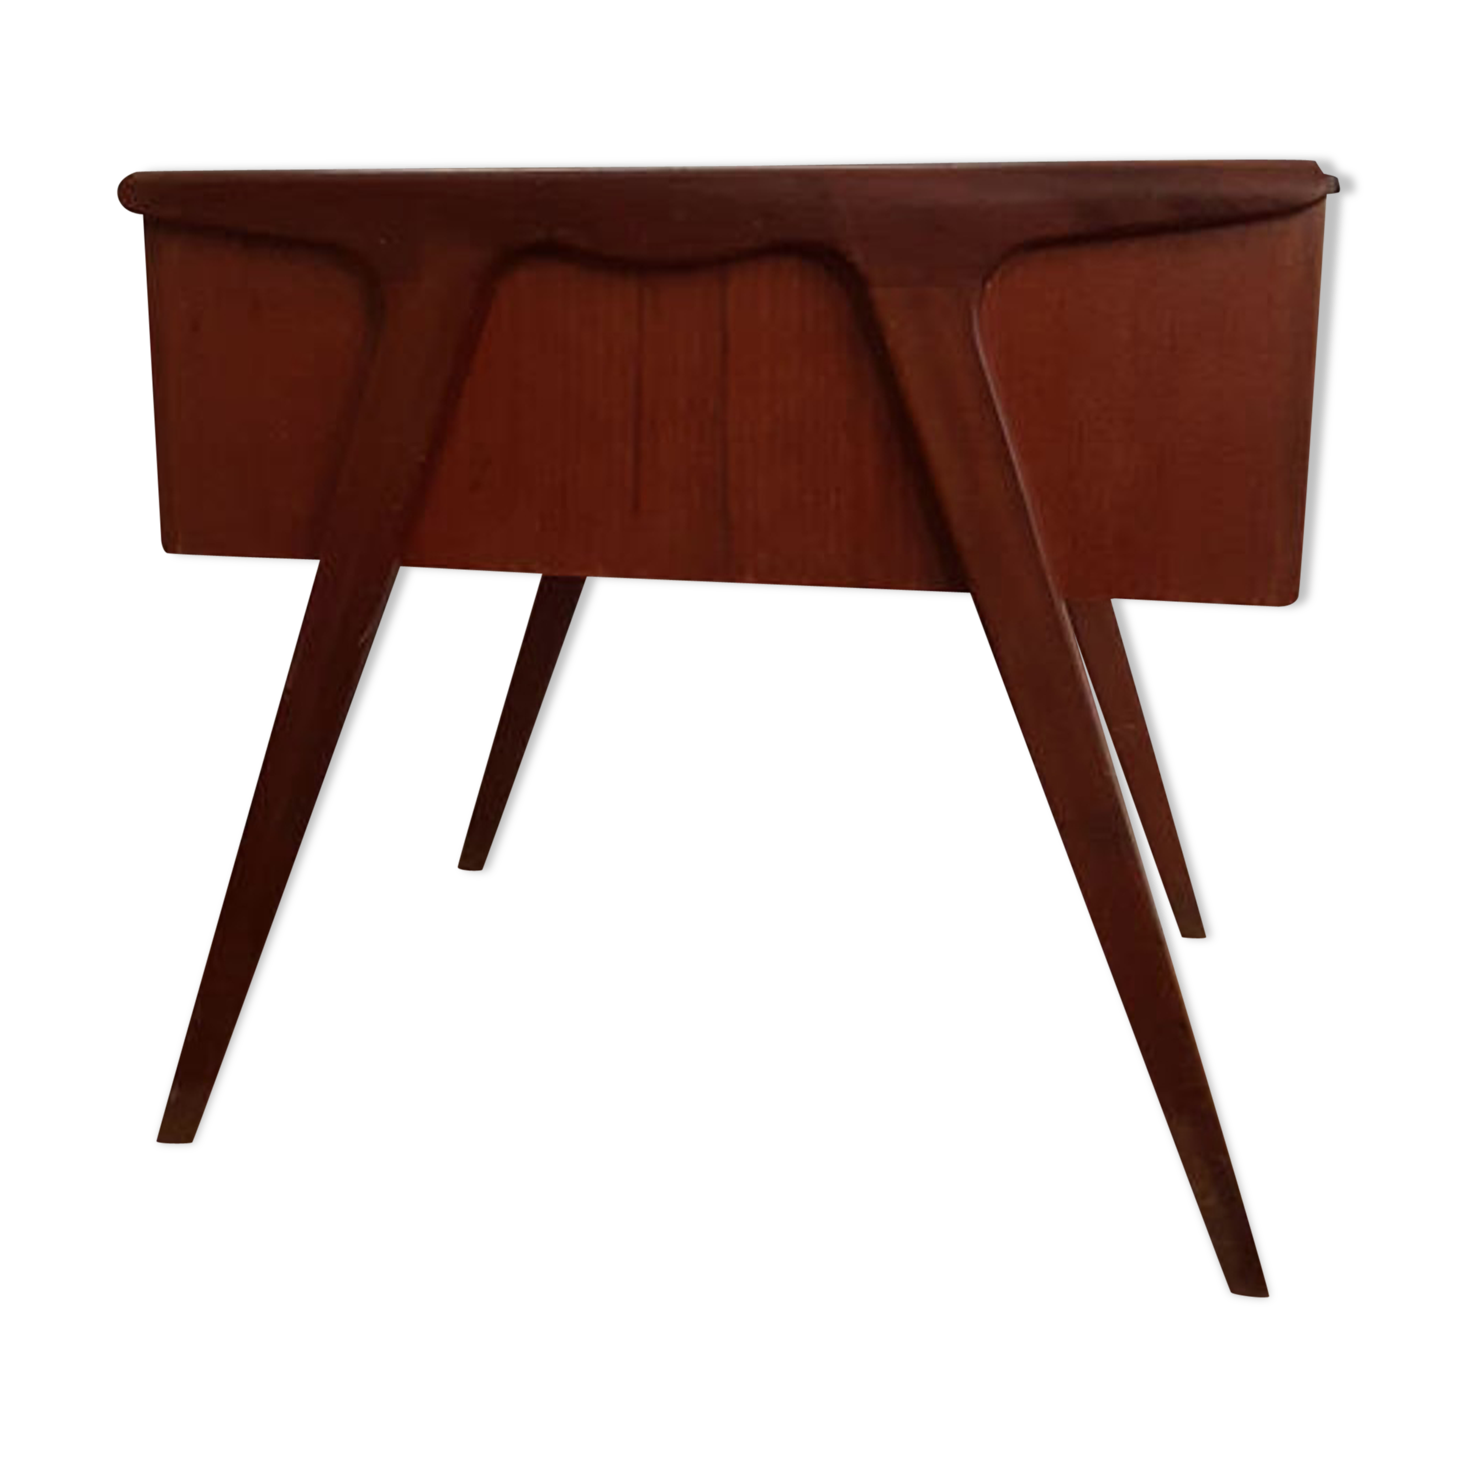 table de couture pliante finest amazing latest table cuisine pliante leroy merlin u colombes. Black Bedroom Furniture Sets. Home Design Ideas